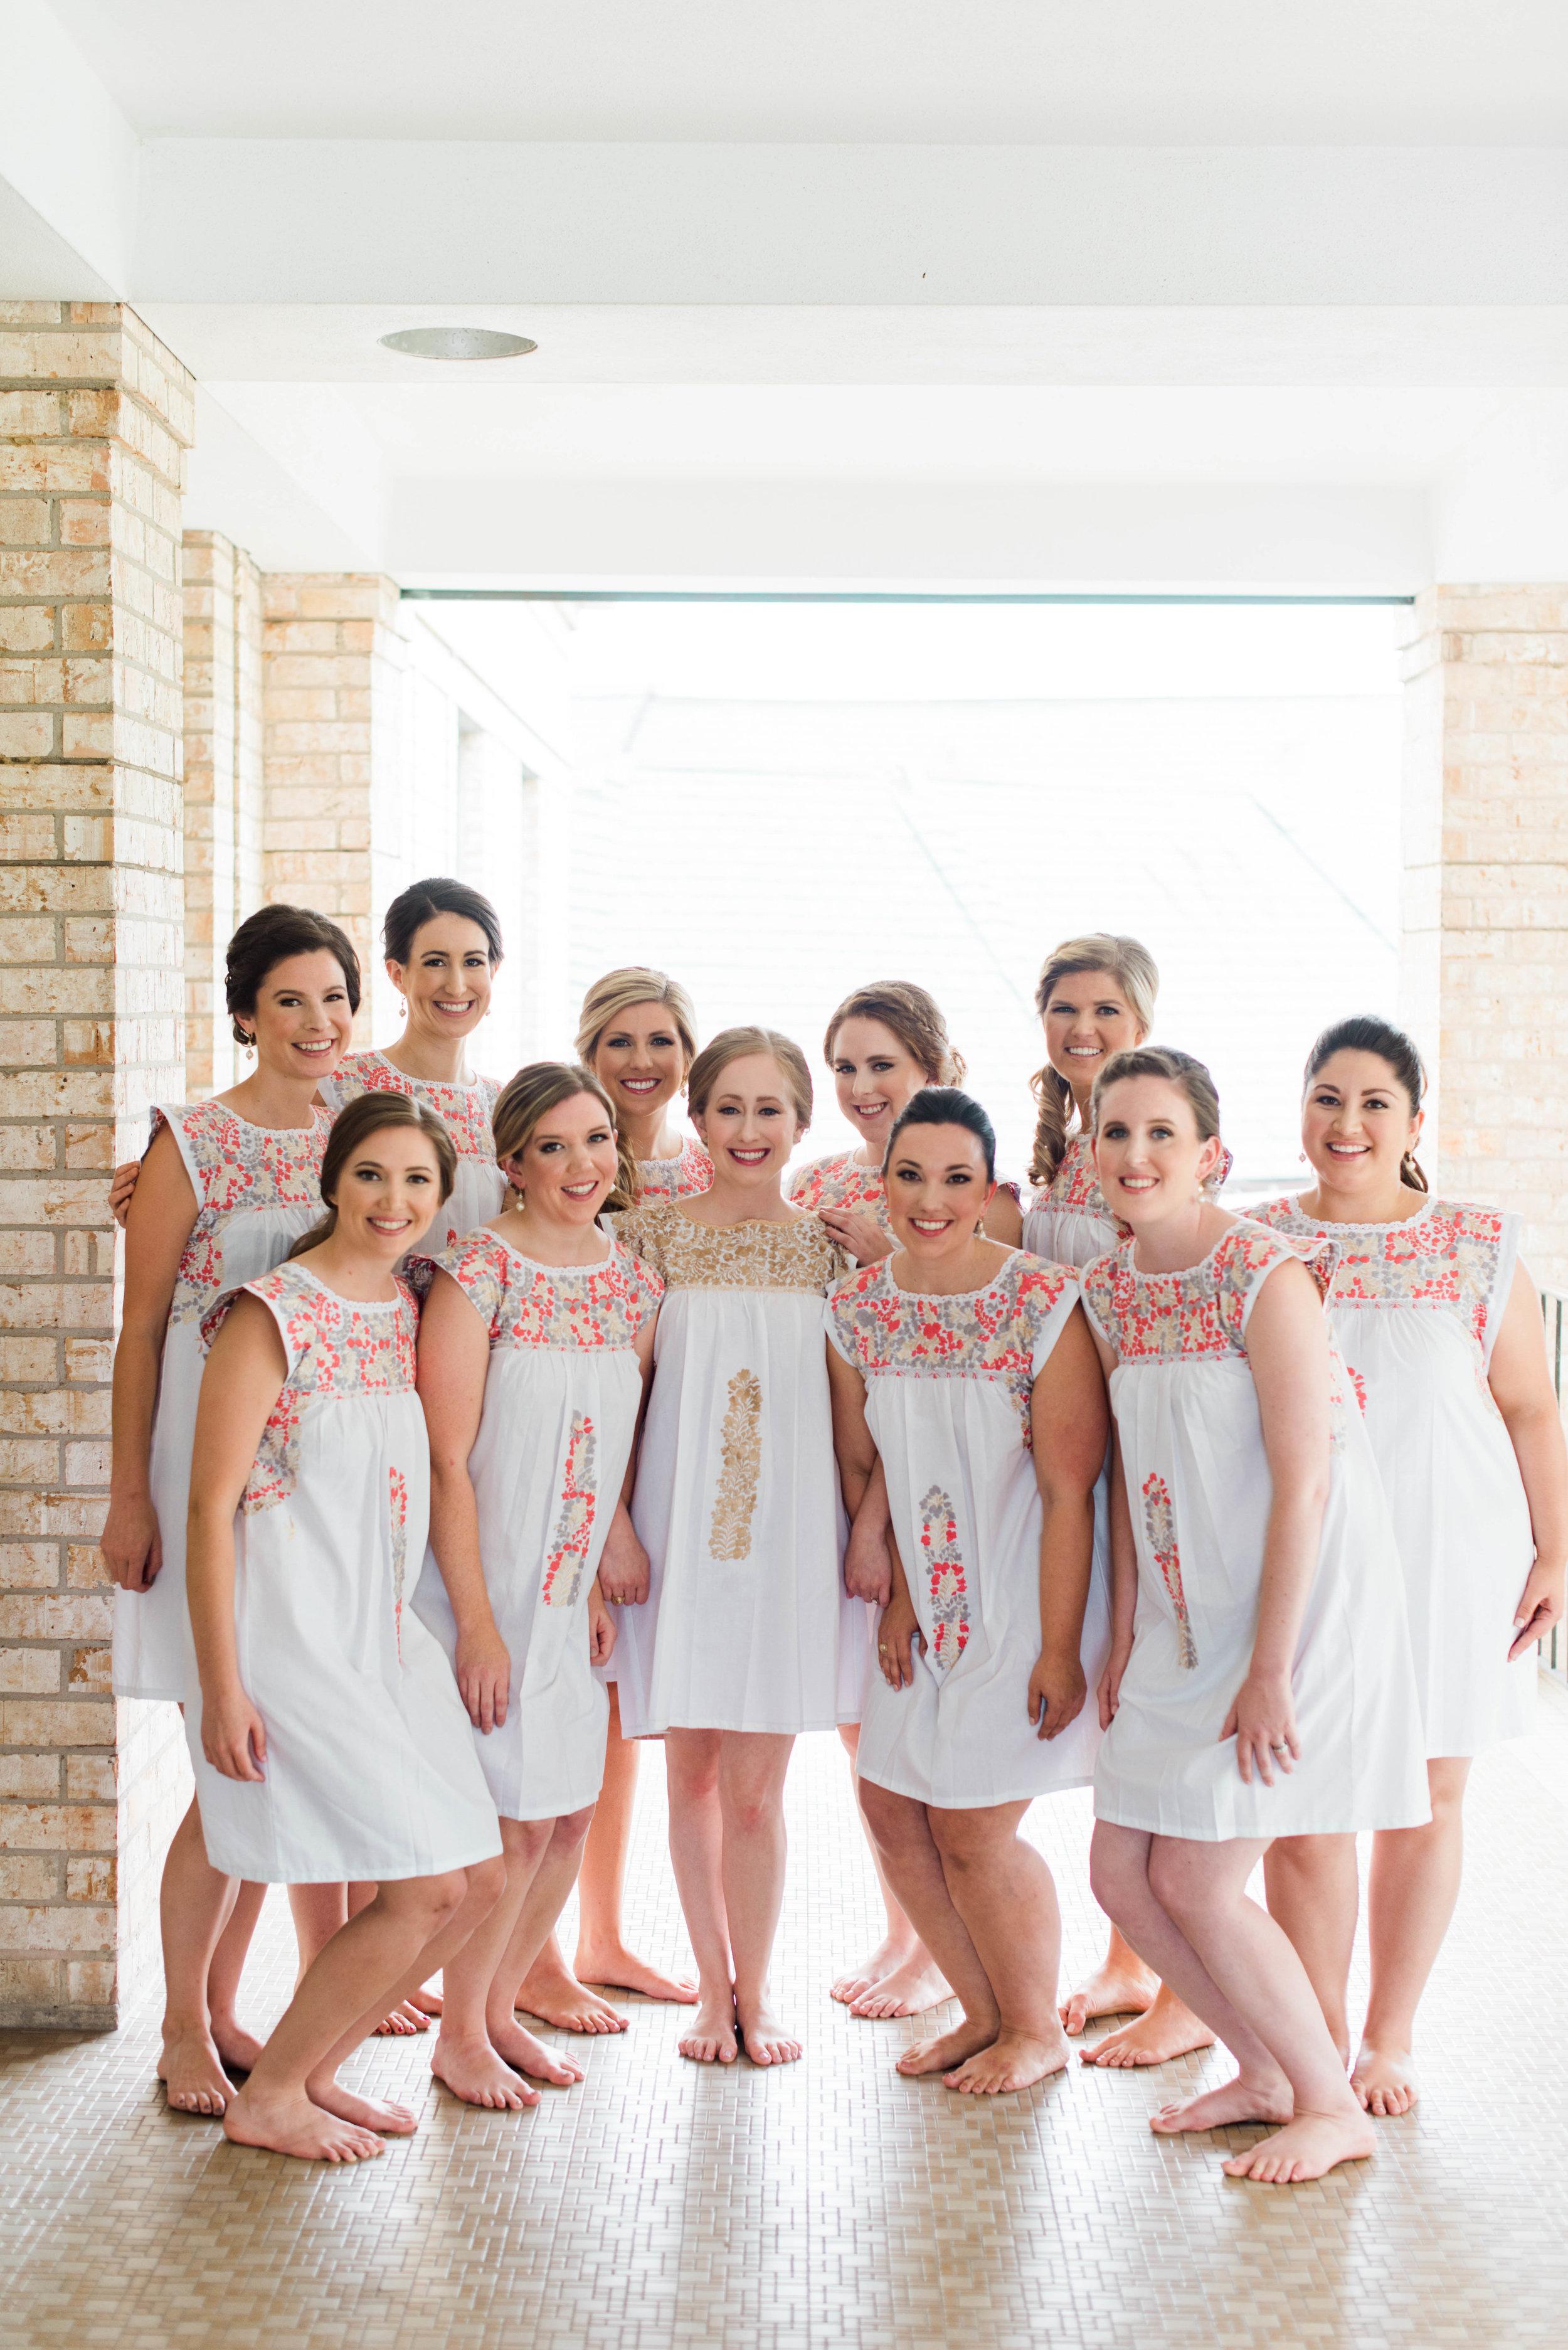 Fine-Art-Film-Houston-Wedding-Photographer-Best-Top-Luxury-Texas-Austin-Dallas-Destination-Dana-Fernandez-Photography-River-Oaks-Country-Club-South-Main-Baptist-Ceremony-Reception-Wedding-4.jpg